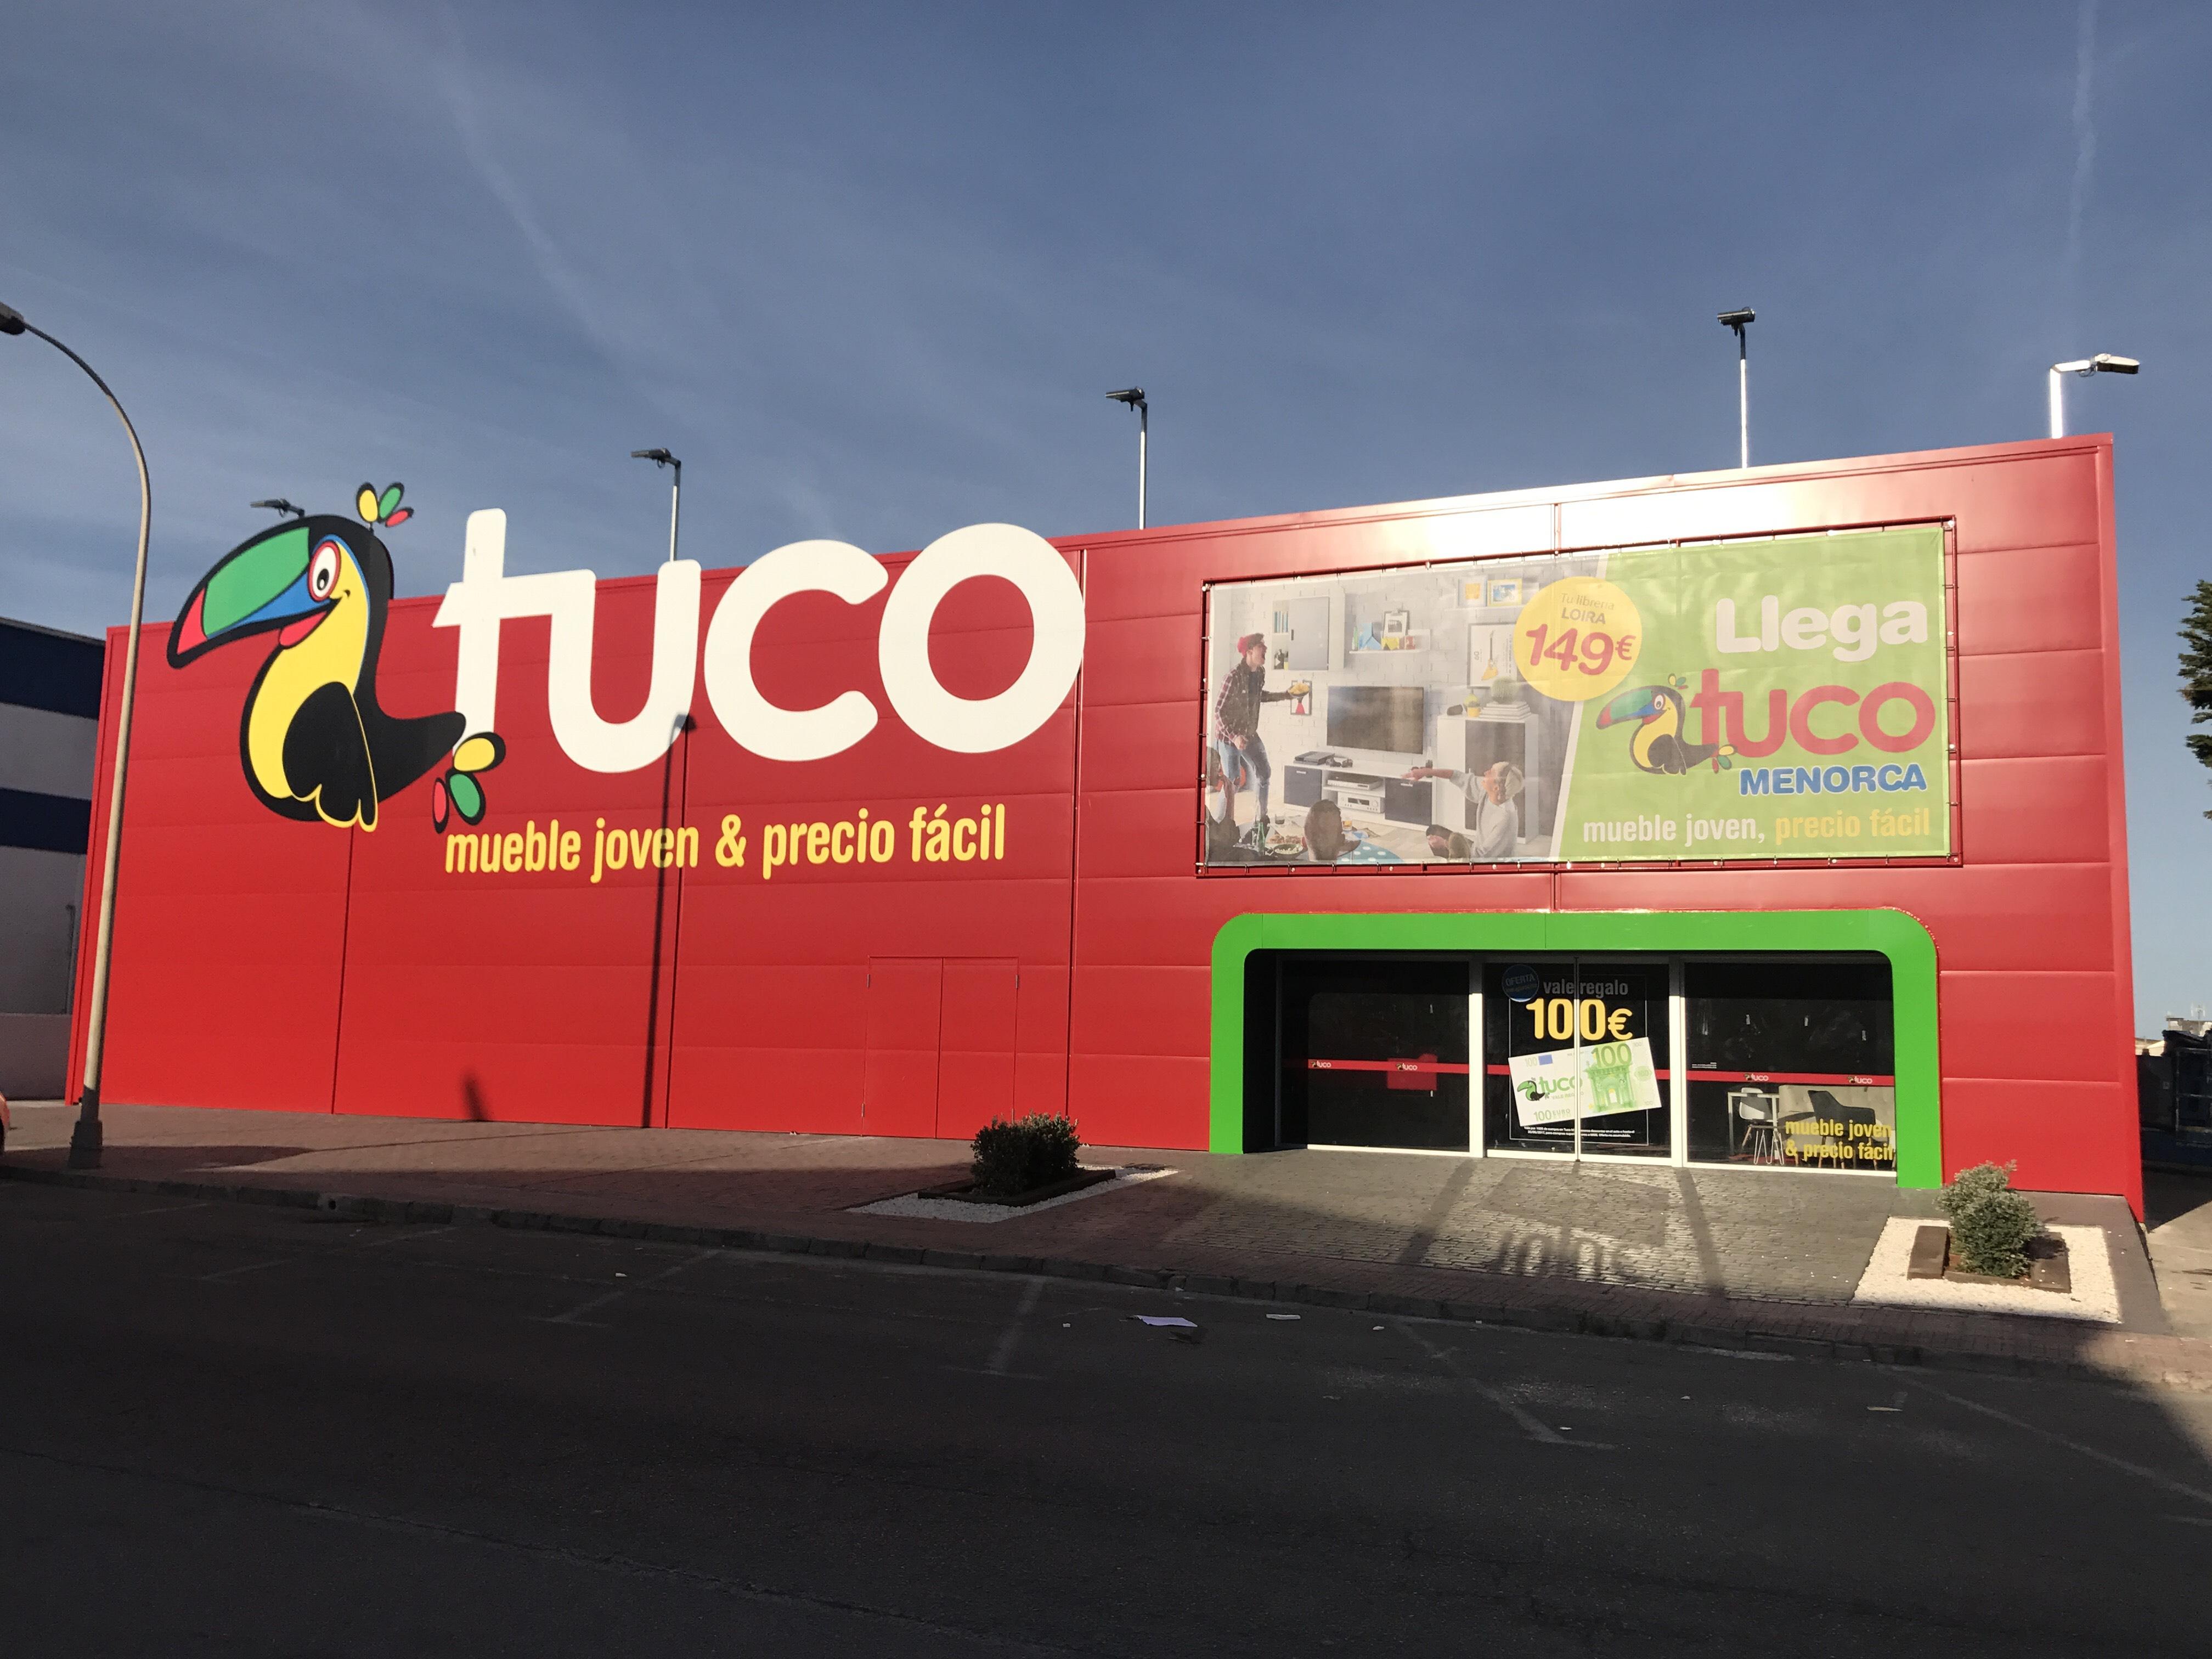 Tuco-Menorca